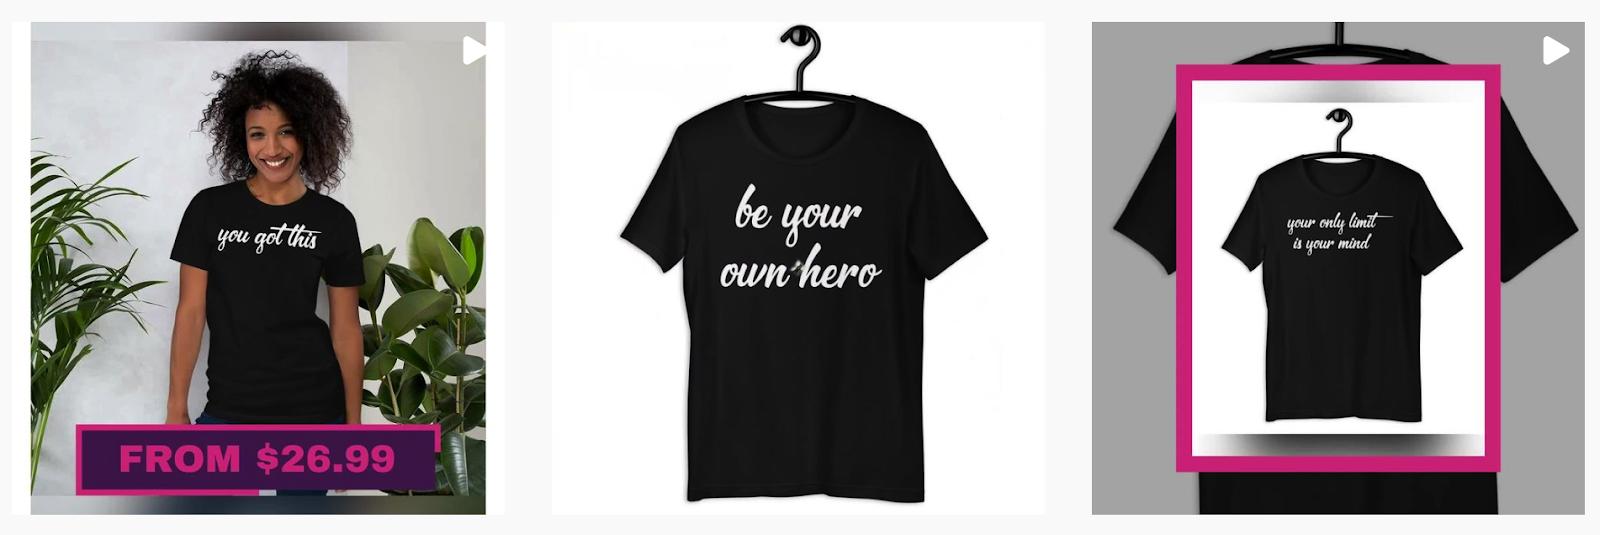 I Luv Me Shop | Motivational black t-shirts